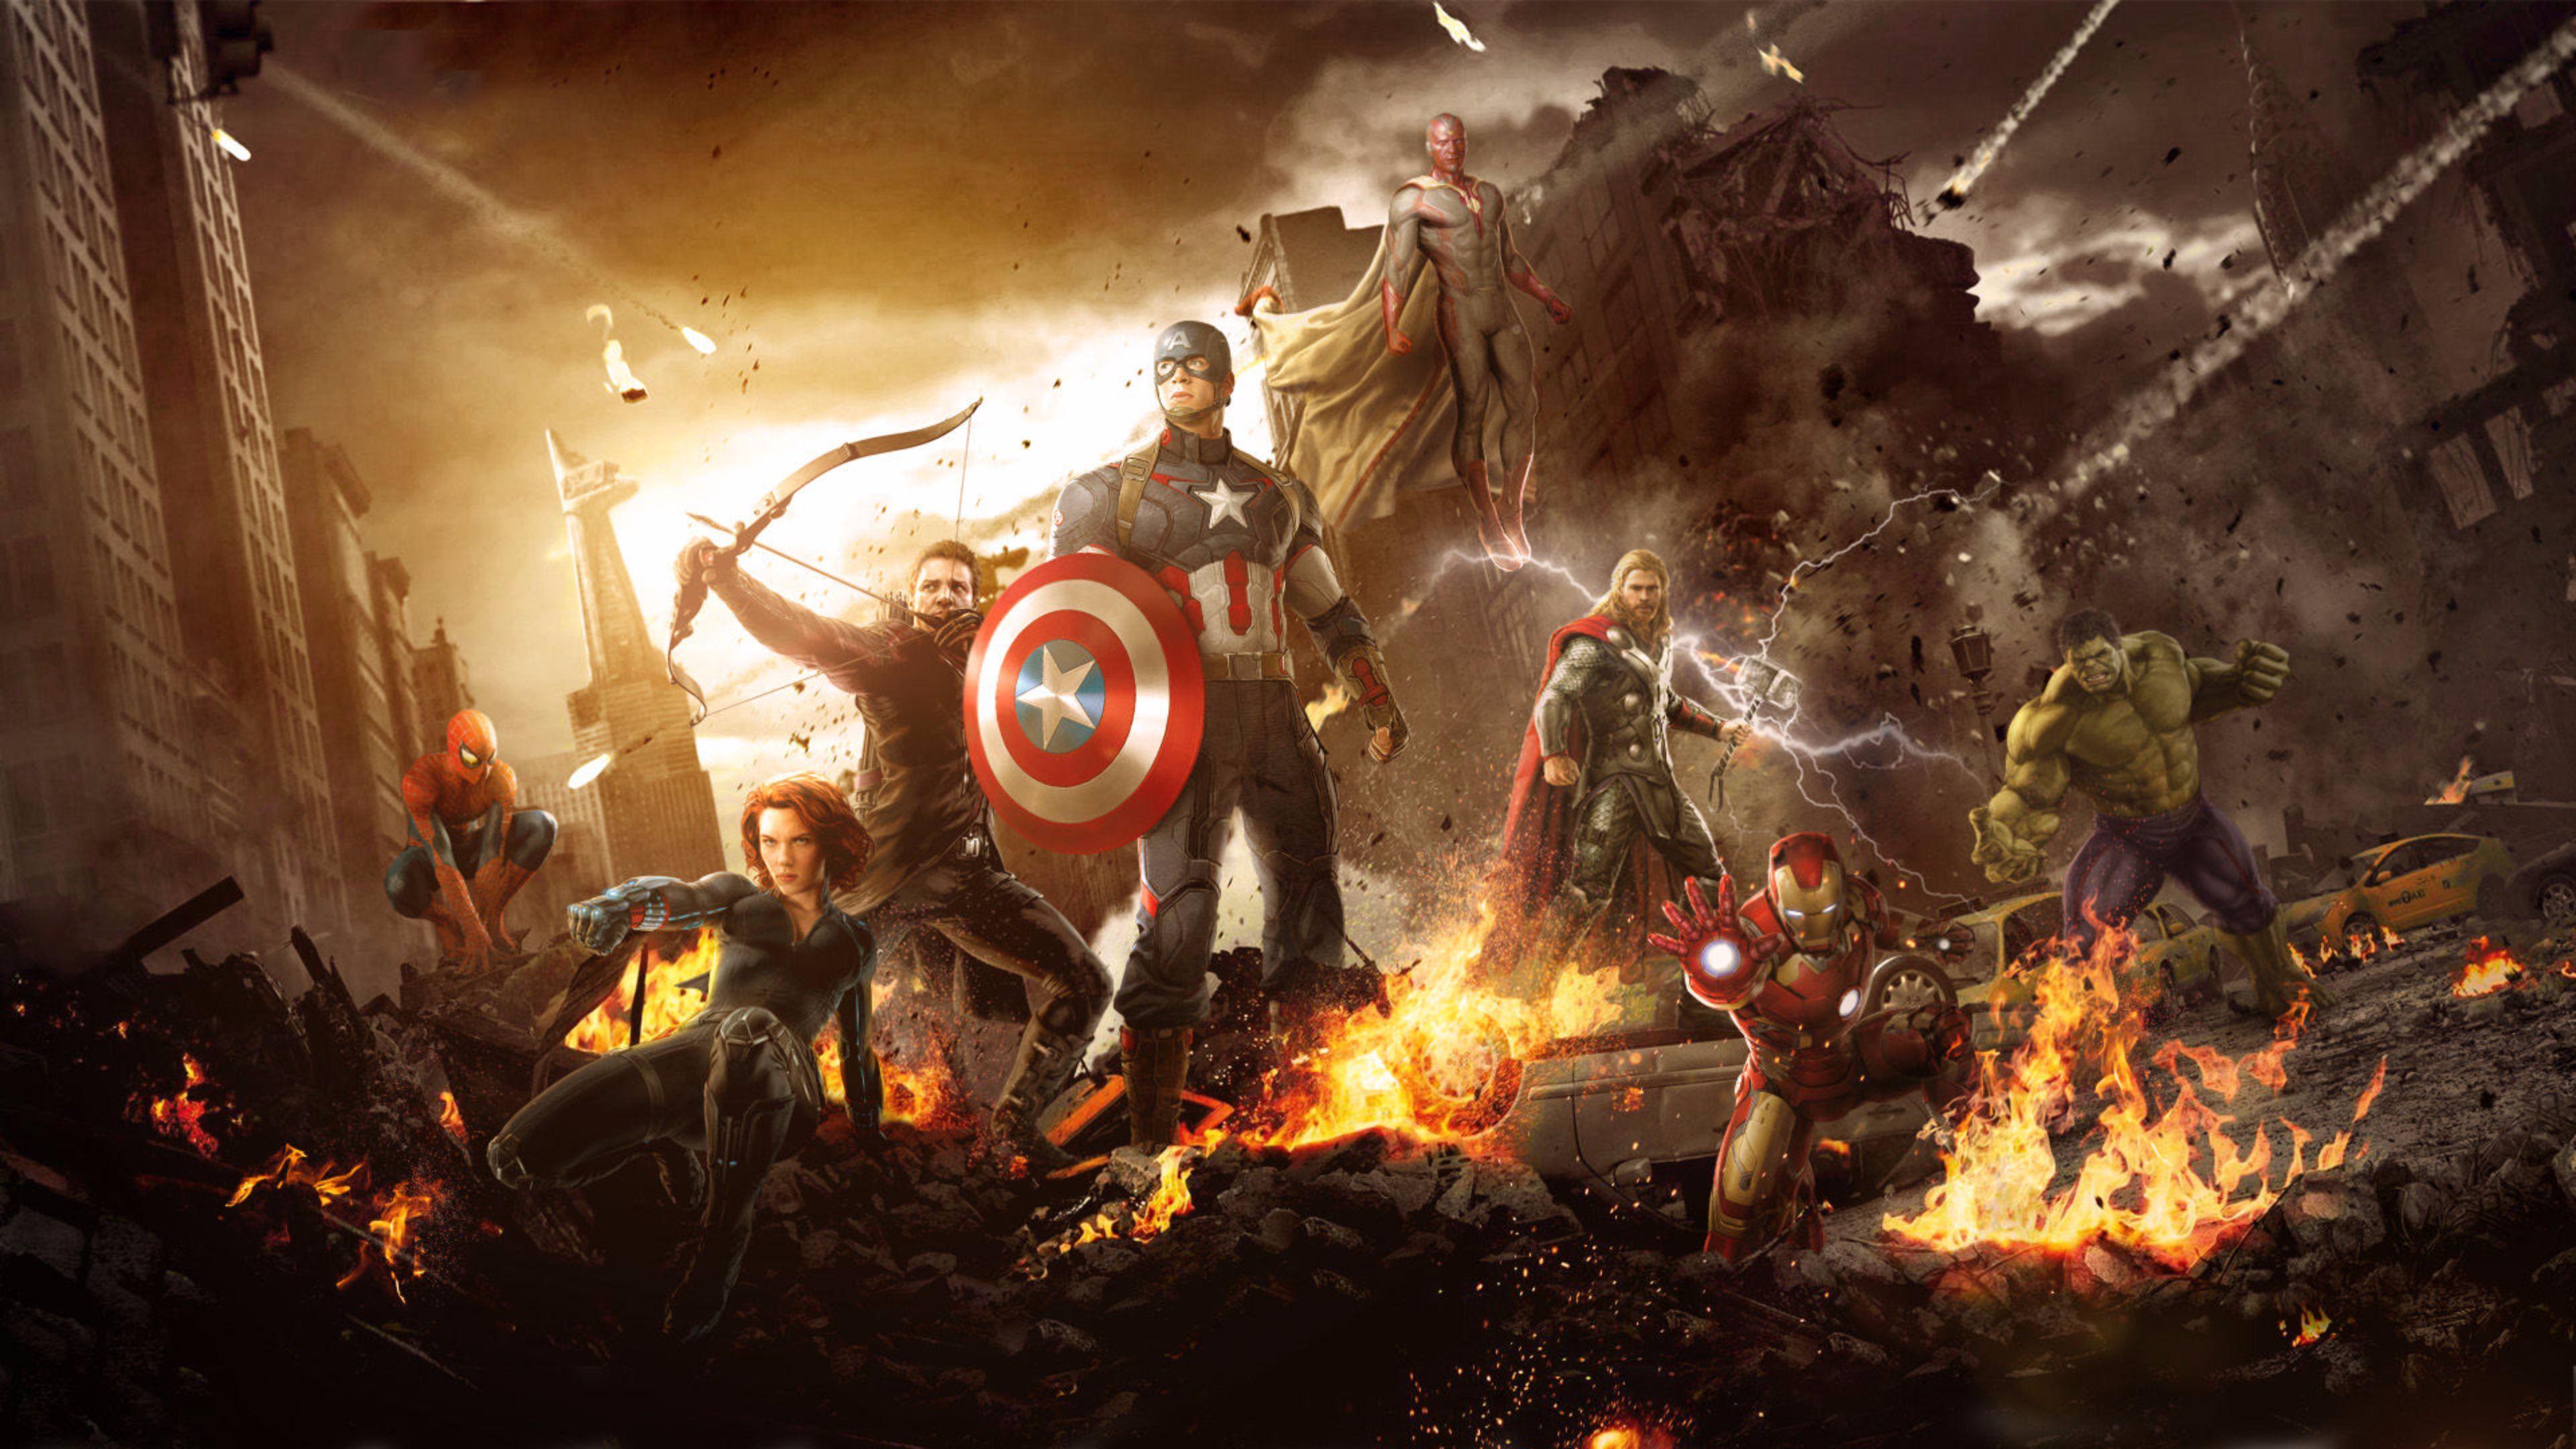 New Avengers Age Of Ultron 4k Wallpaper